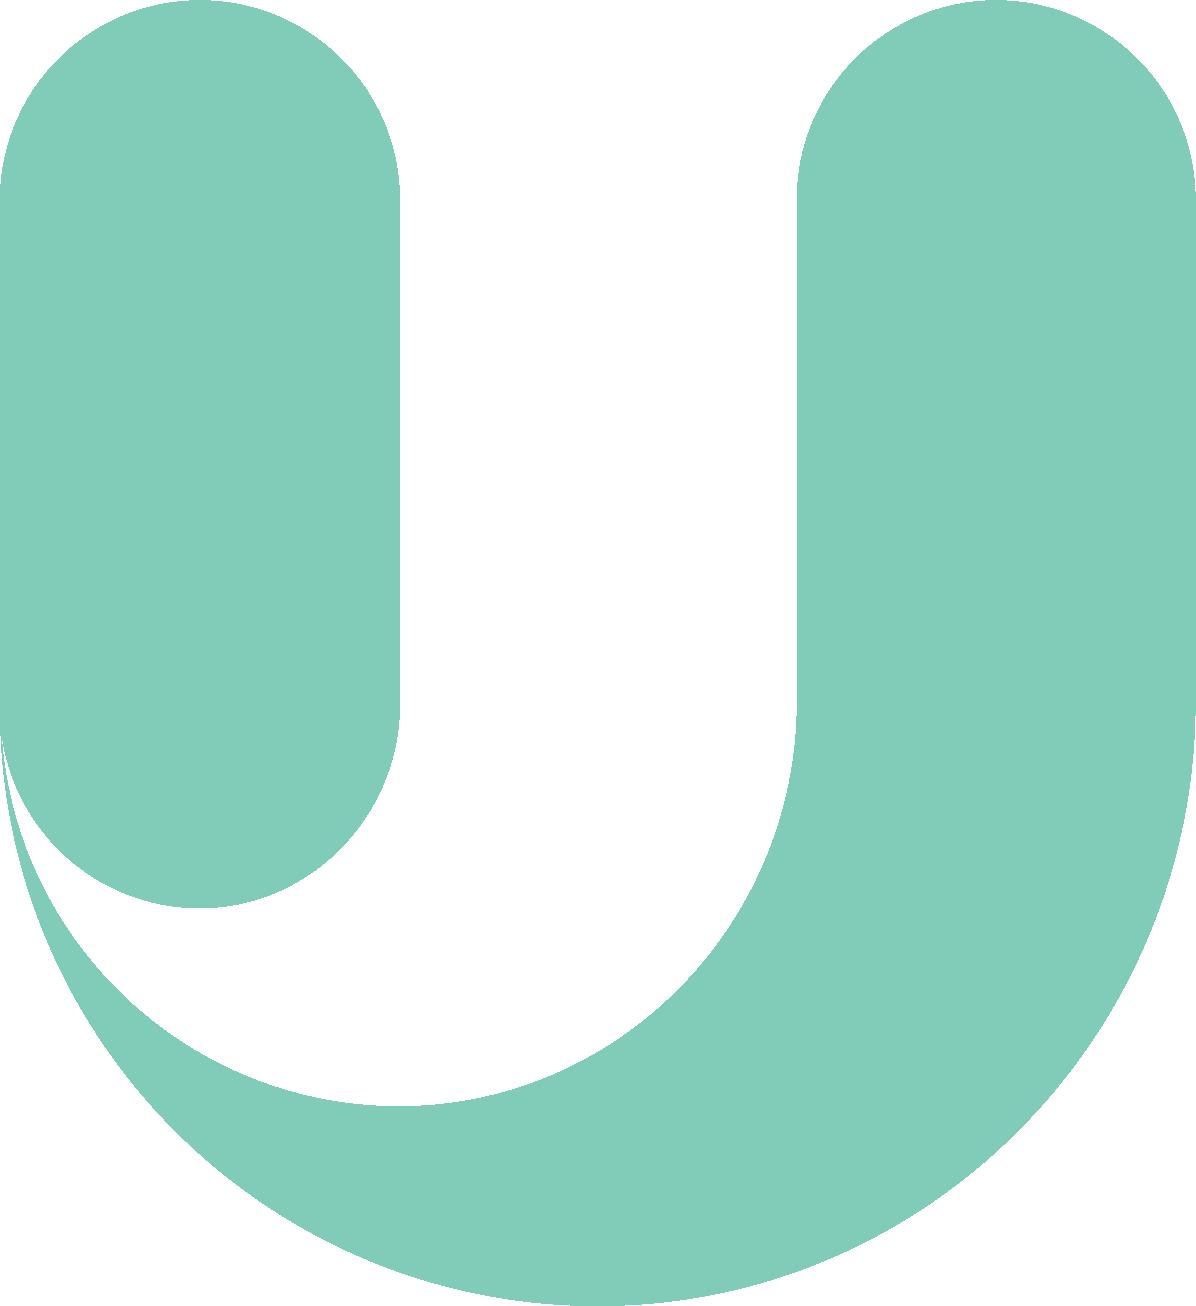 Upstream-Flat-Icon-RGB